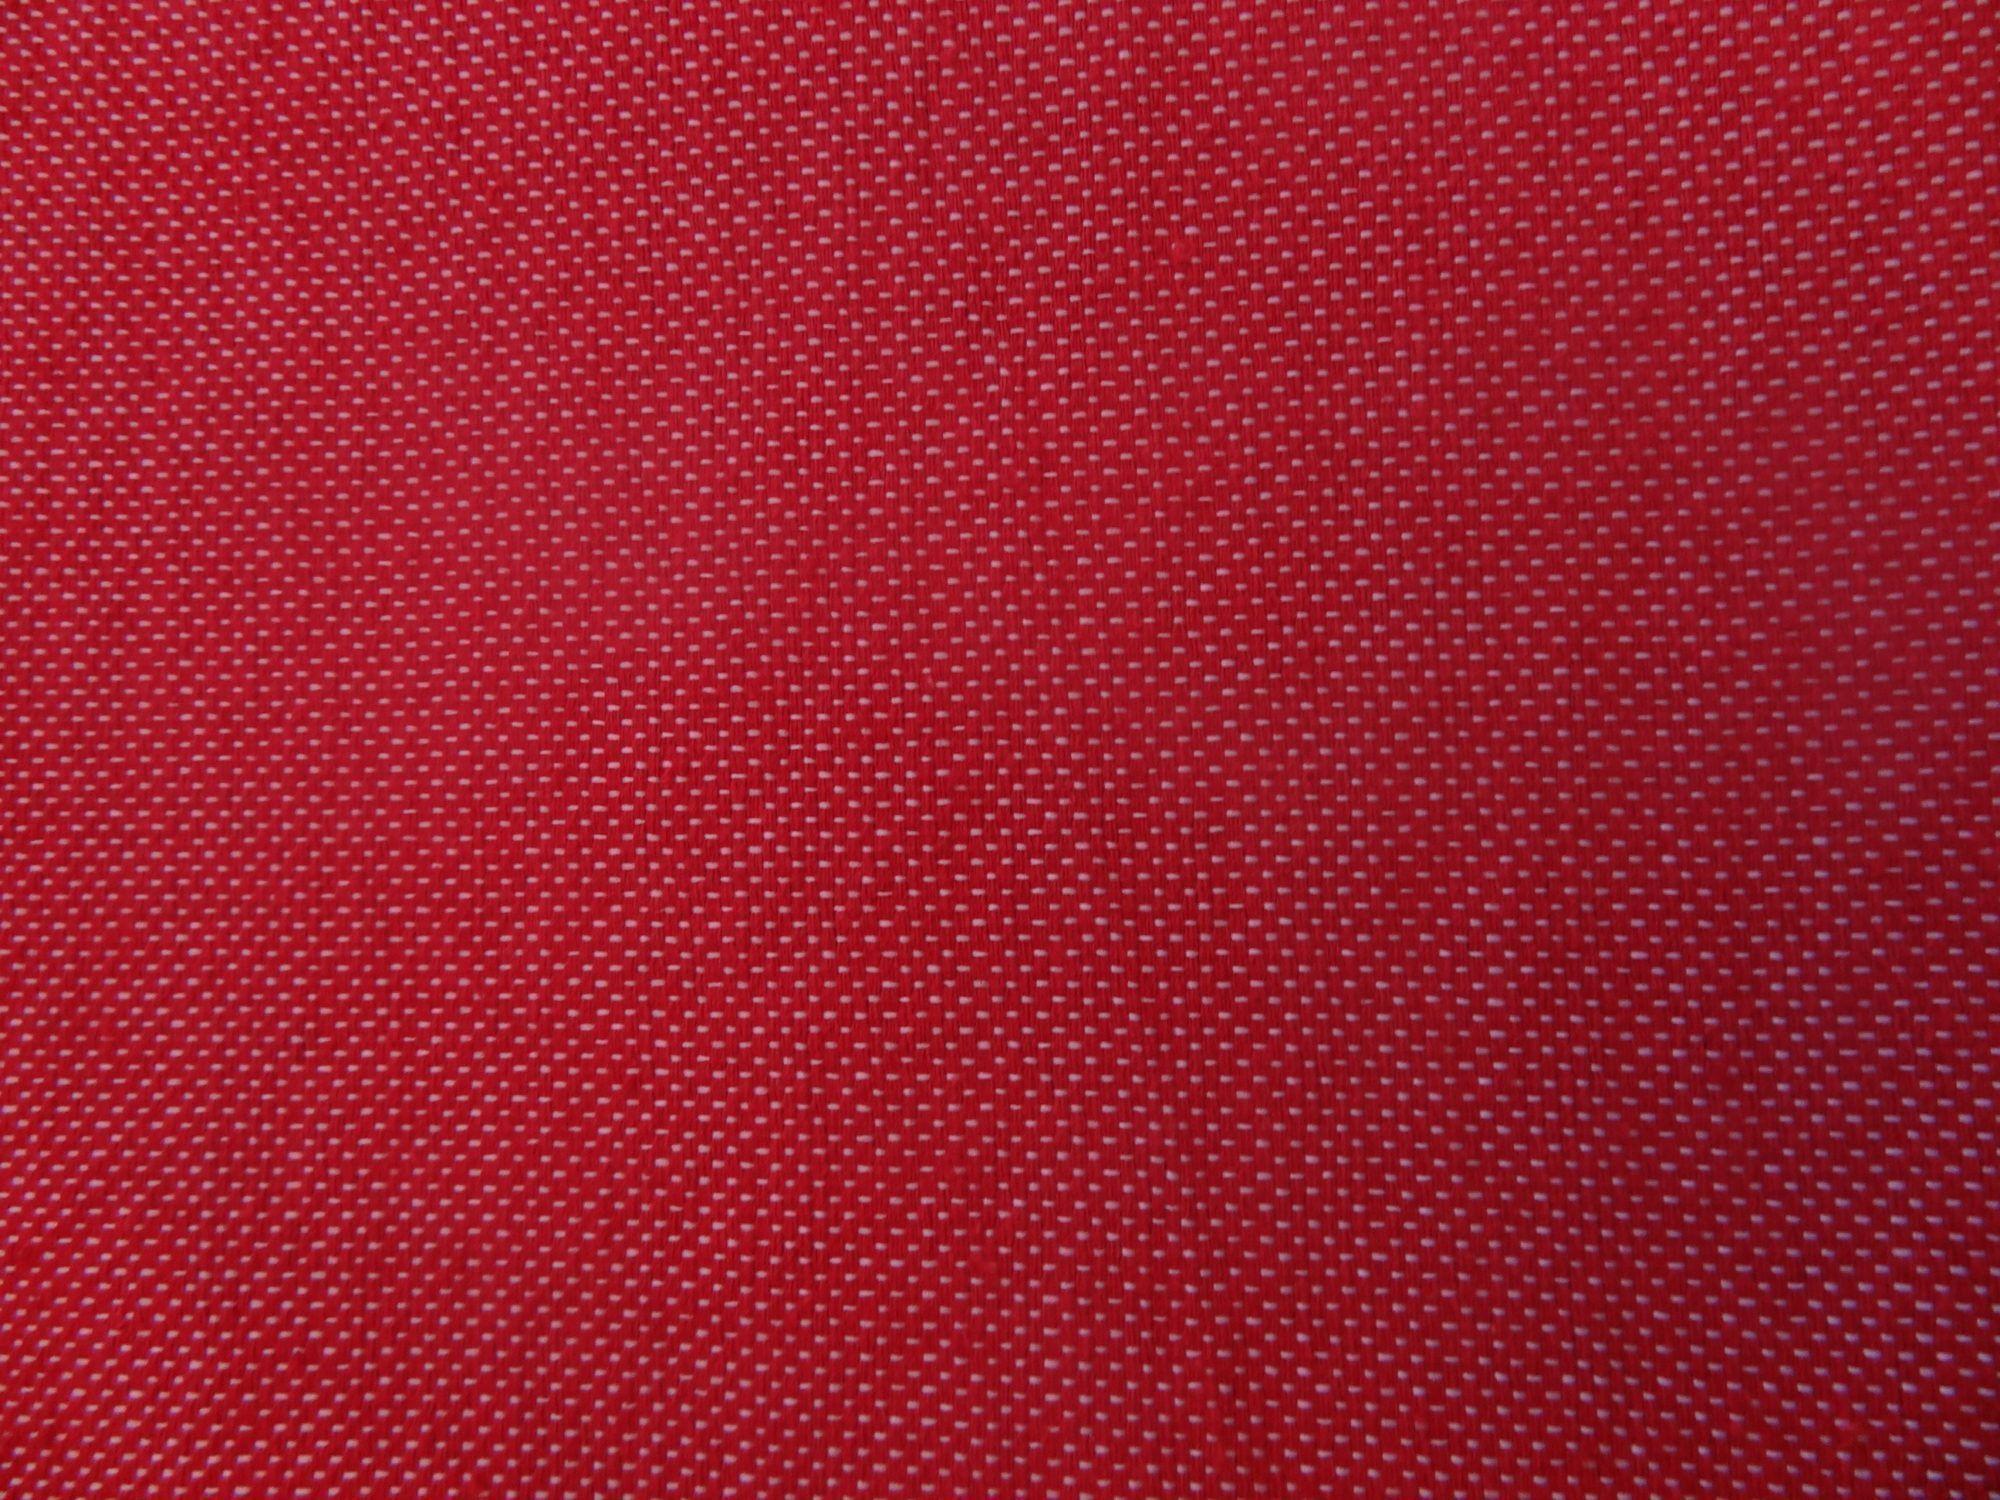 Cubre sof rojo jarapa hilacar artesanos alpujarra bubi n - Artesanos del sofa ...